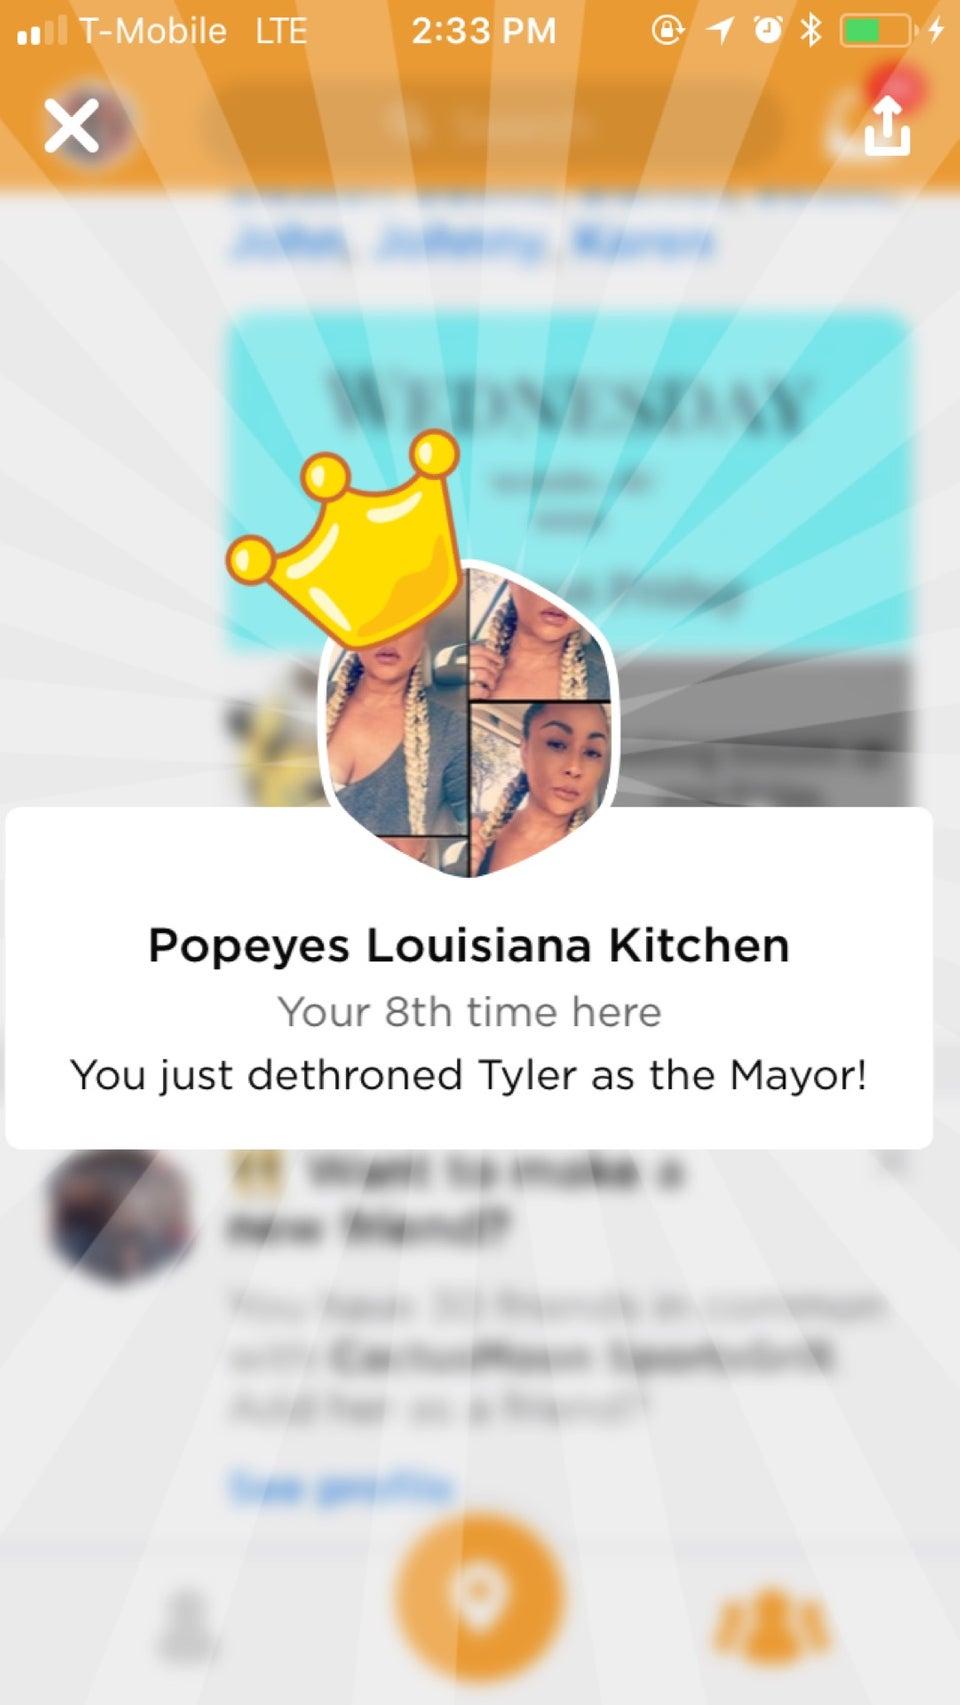 Popeyes Louisiana Kitchen 2850 S Alma School Rd, Chandler